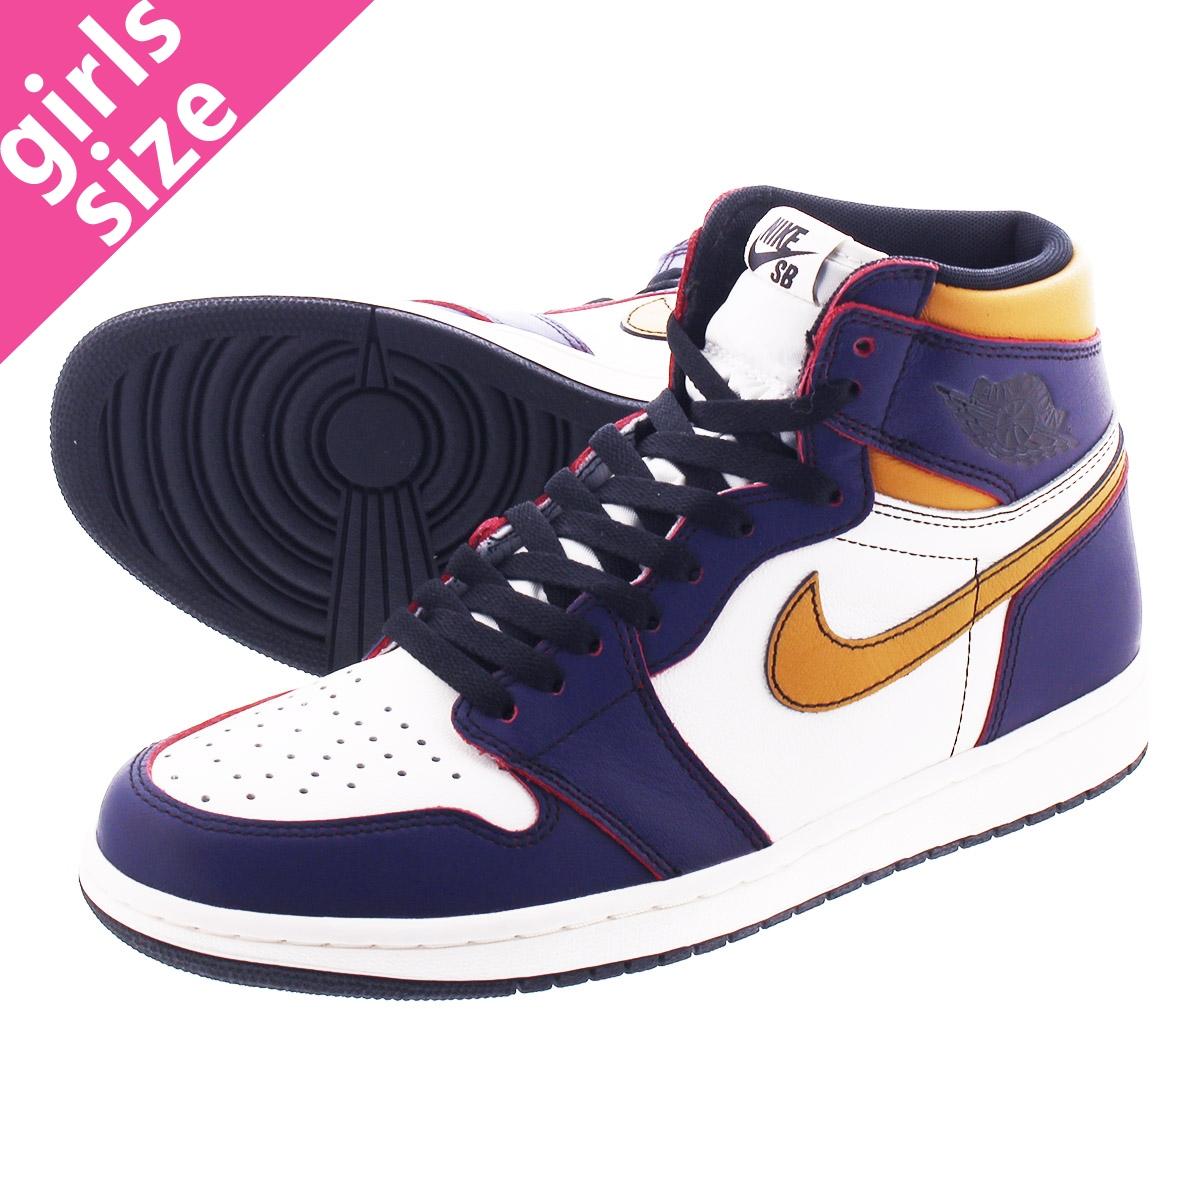 NIKE SB AIR JORDAN 1 RETRO HIGH OG DEFIANT Nike SB Air Jordan 1 nostalgic  high OG ディファイアント COURT PURPLE/BLACK/SAIL/UNIVERSITY GOLD cd6578-507